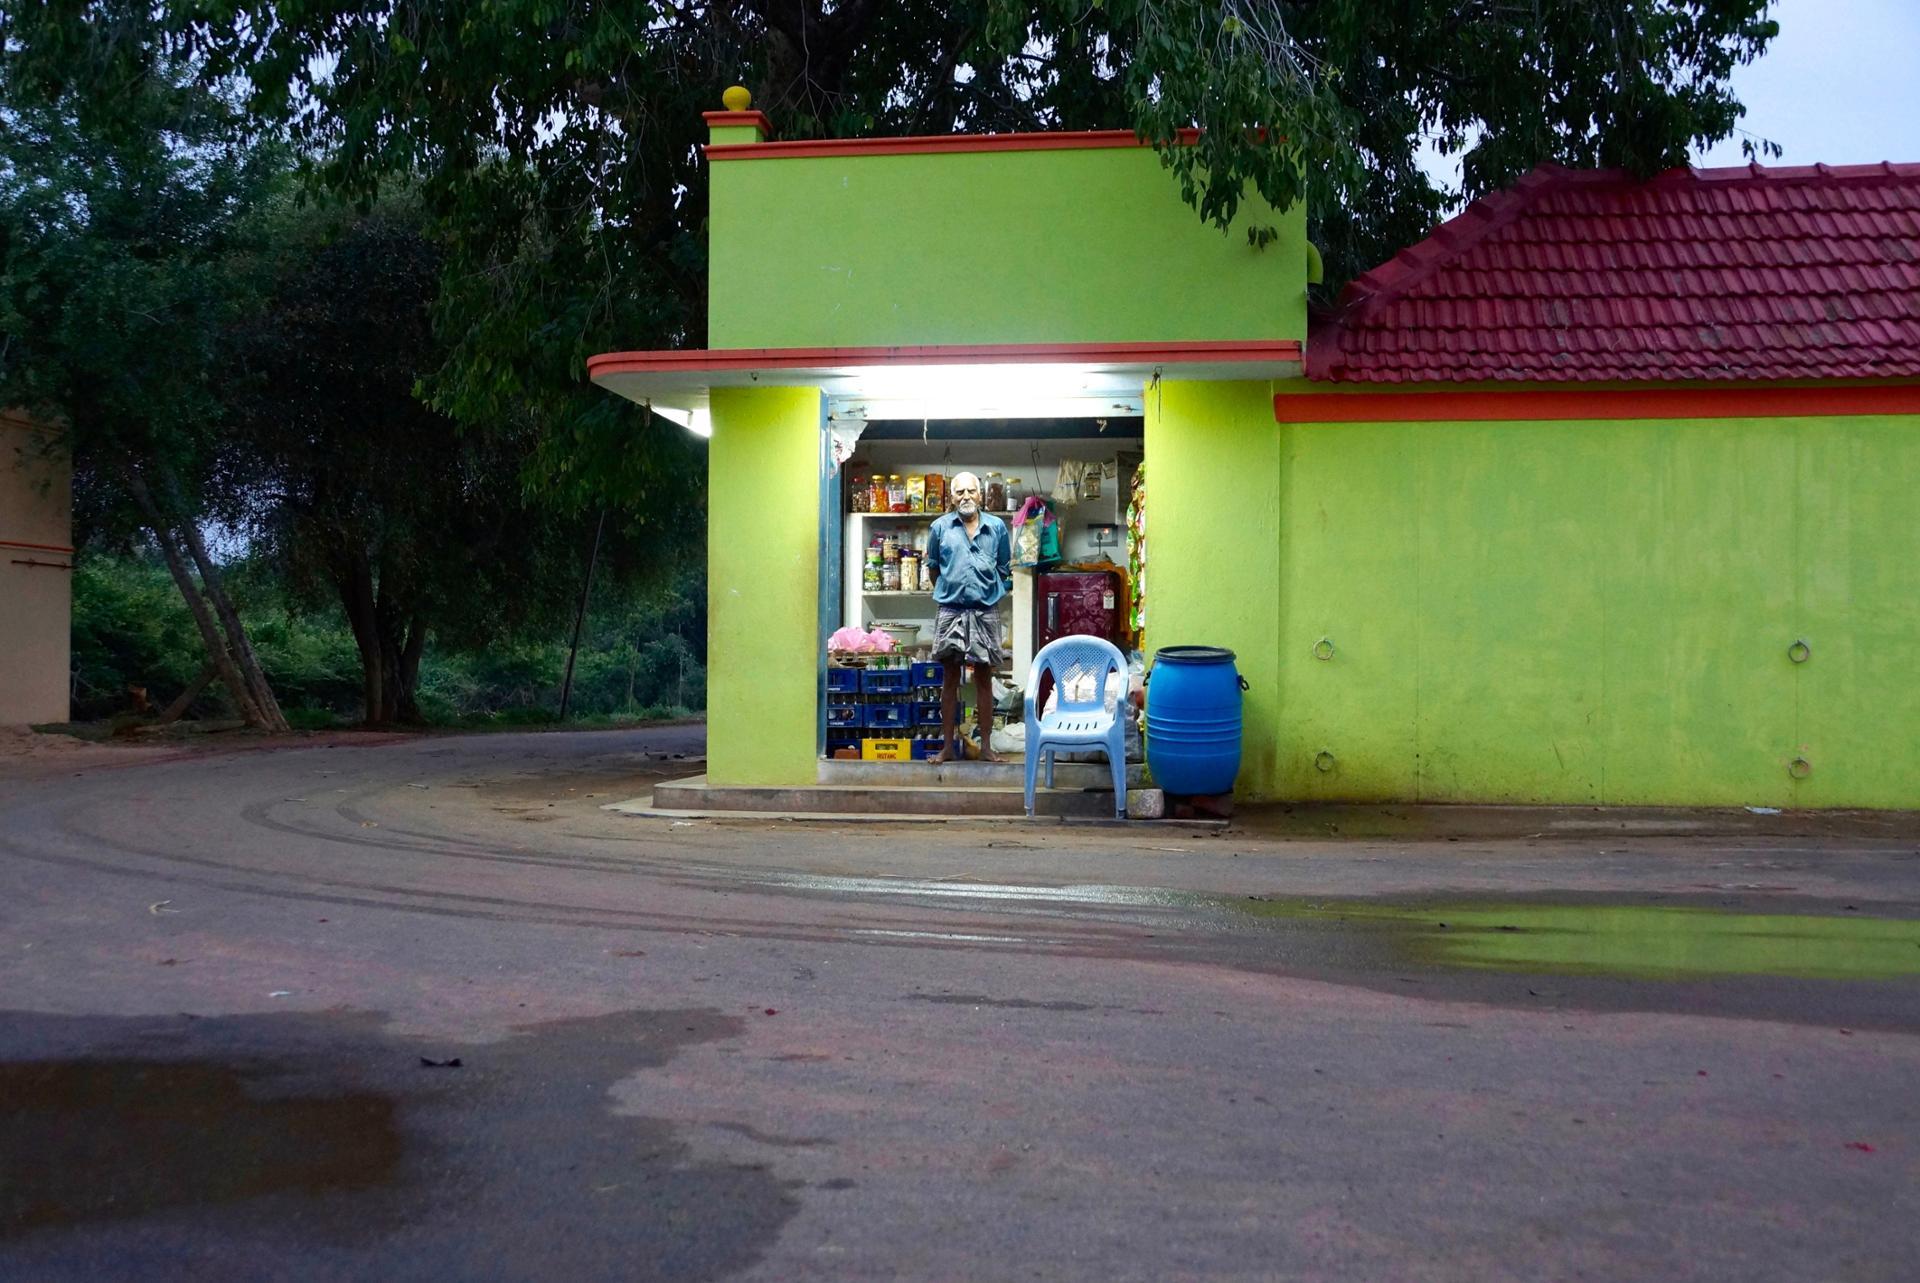 Boutique en Inde